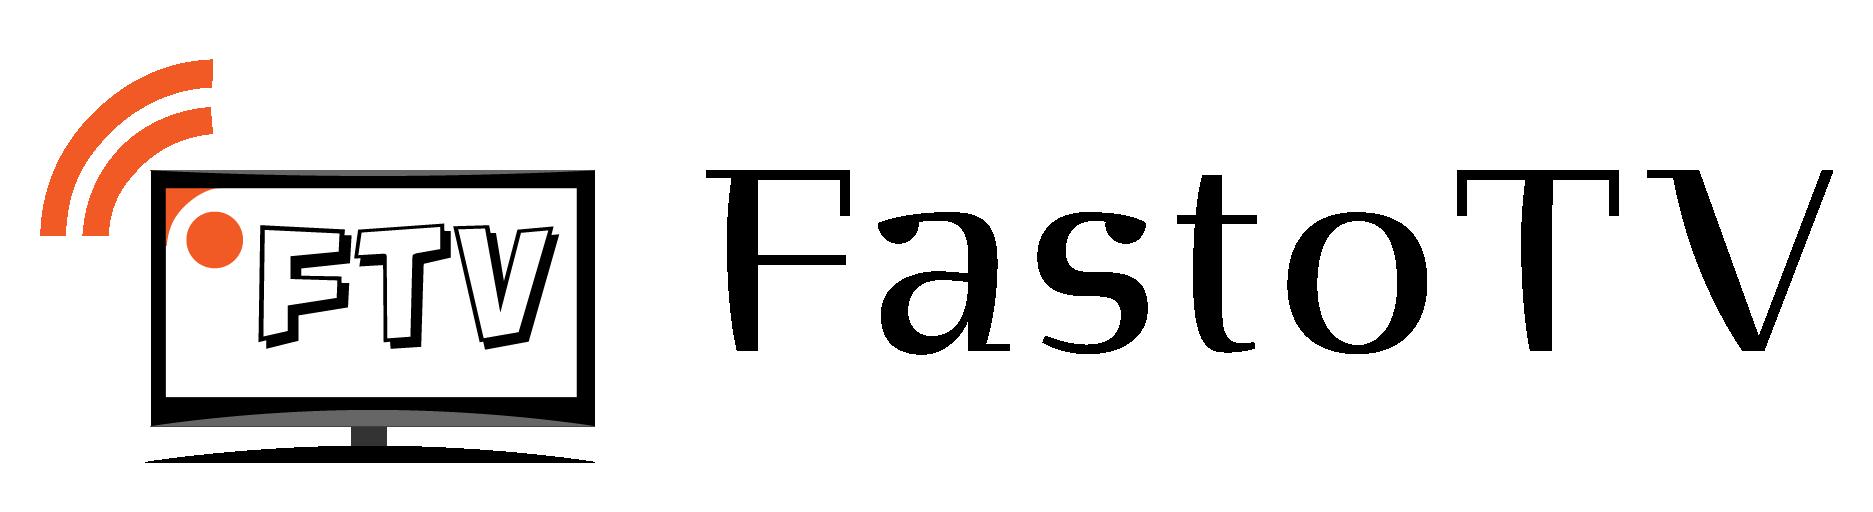 512 px_horizontal-01